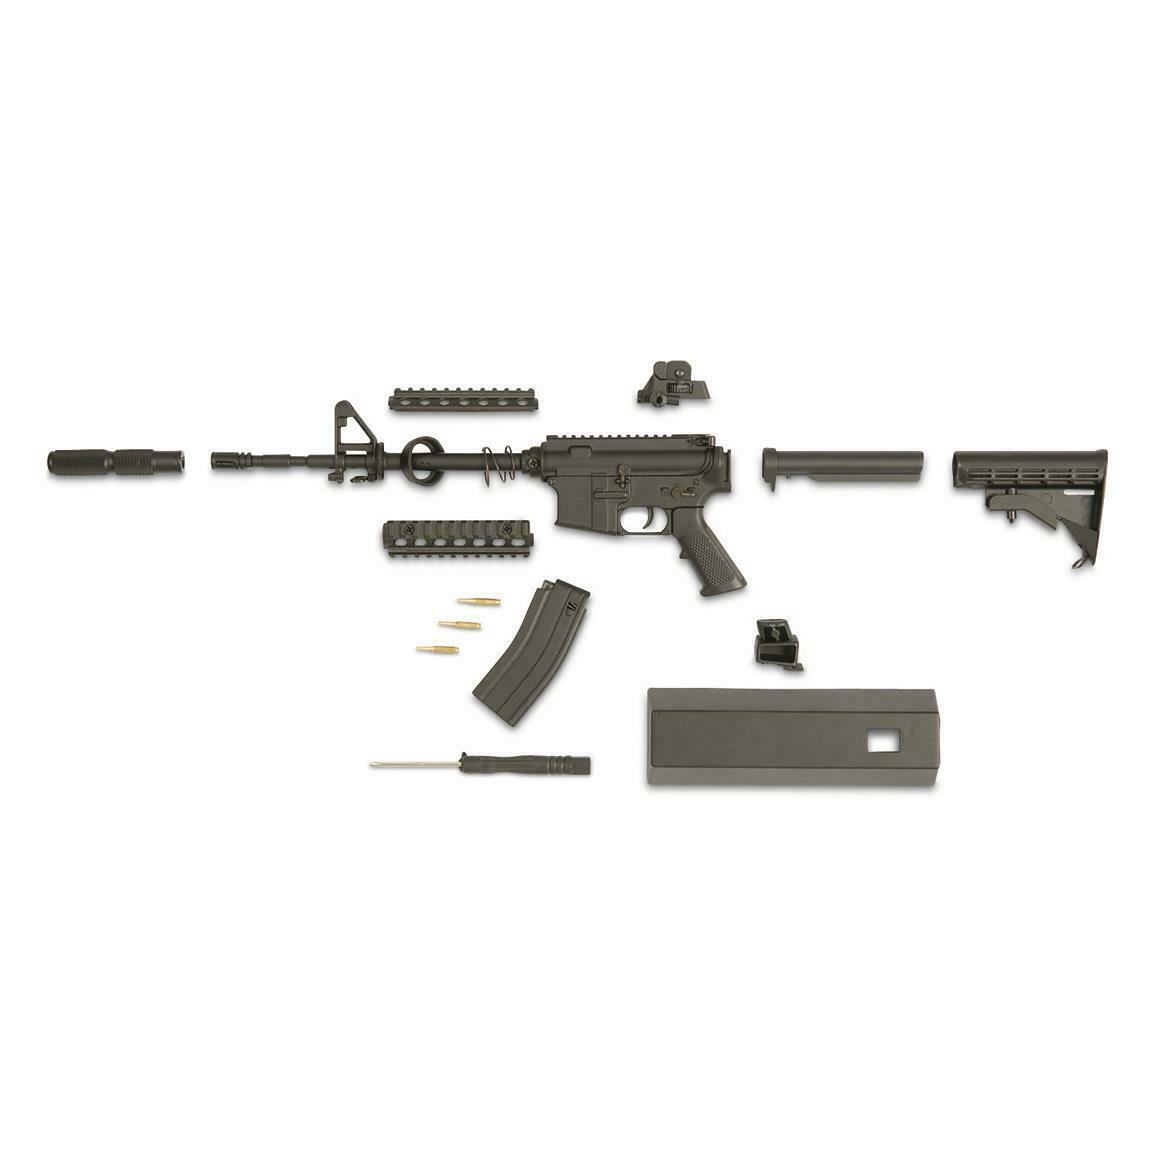 ati-ar15-mini-miniature-replica-model-kit-13-scale-black-non-firing-a-8-10-0054